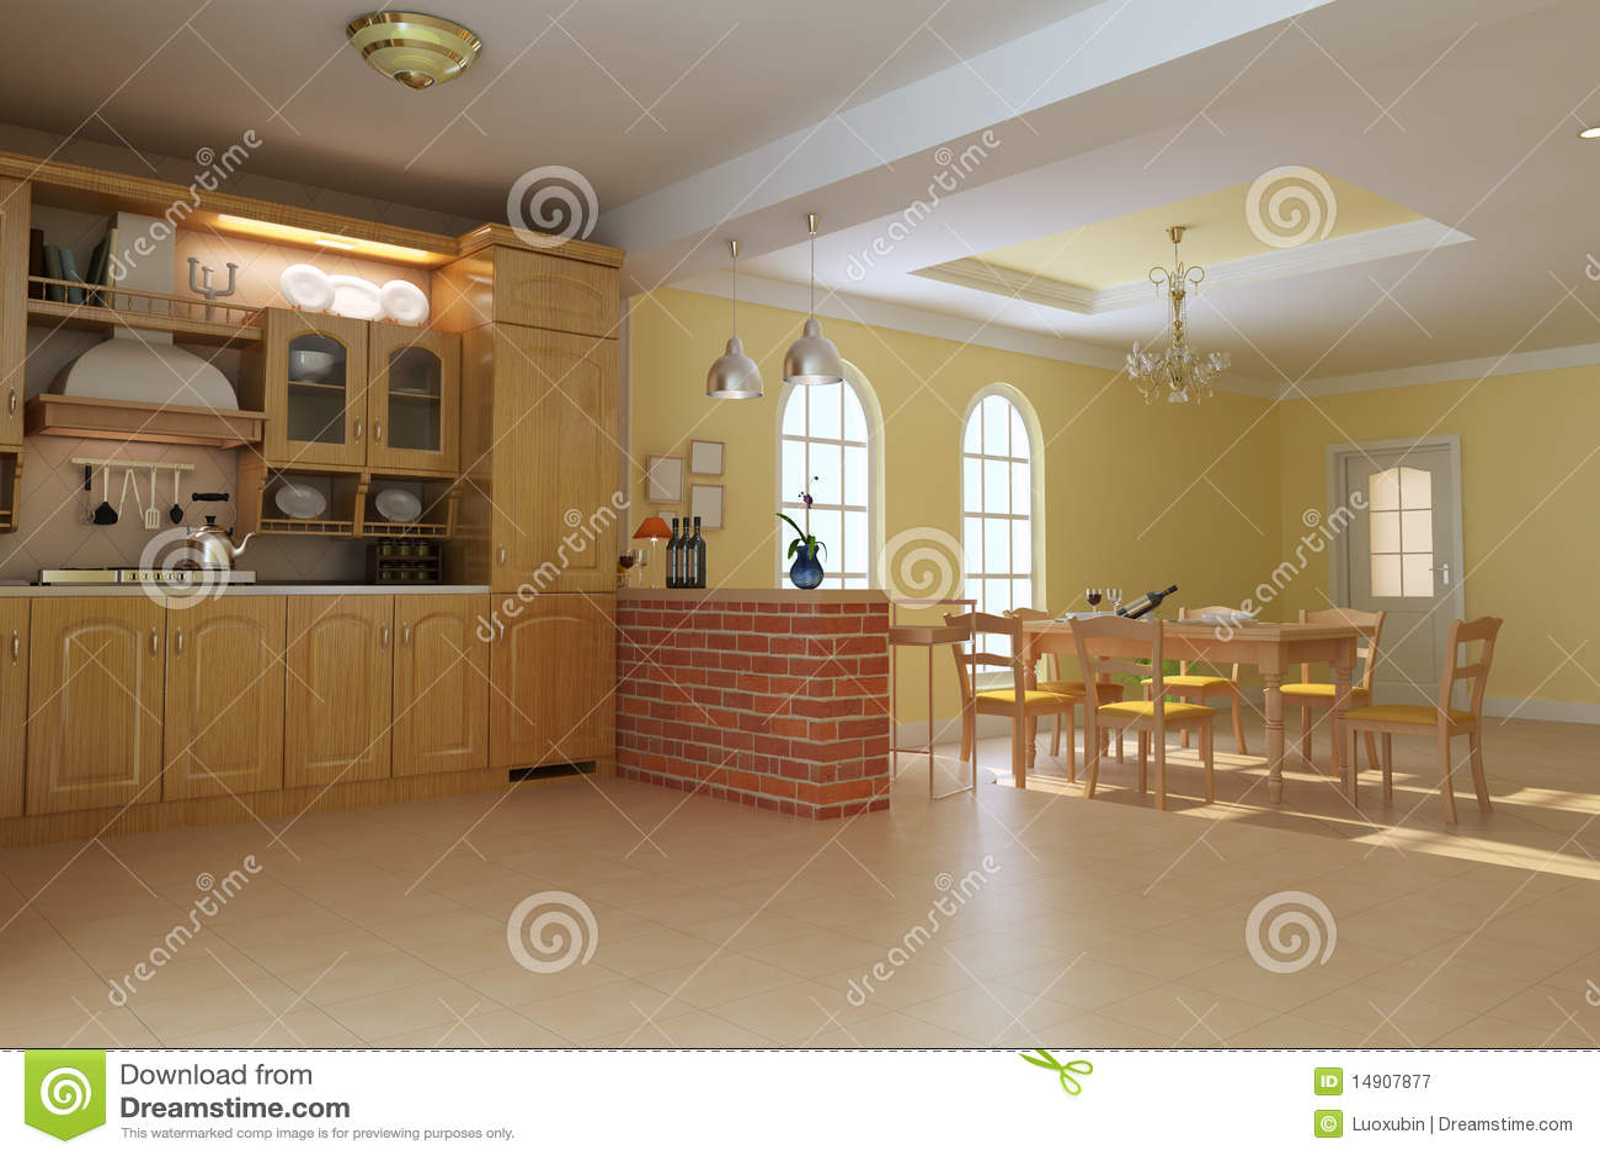 Cucina e sala da pranzo di lusso classiche illustrazione for Cucina e sala insieme